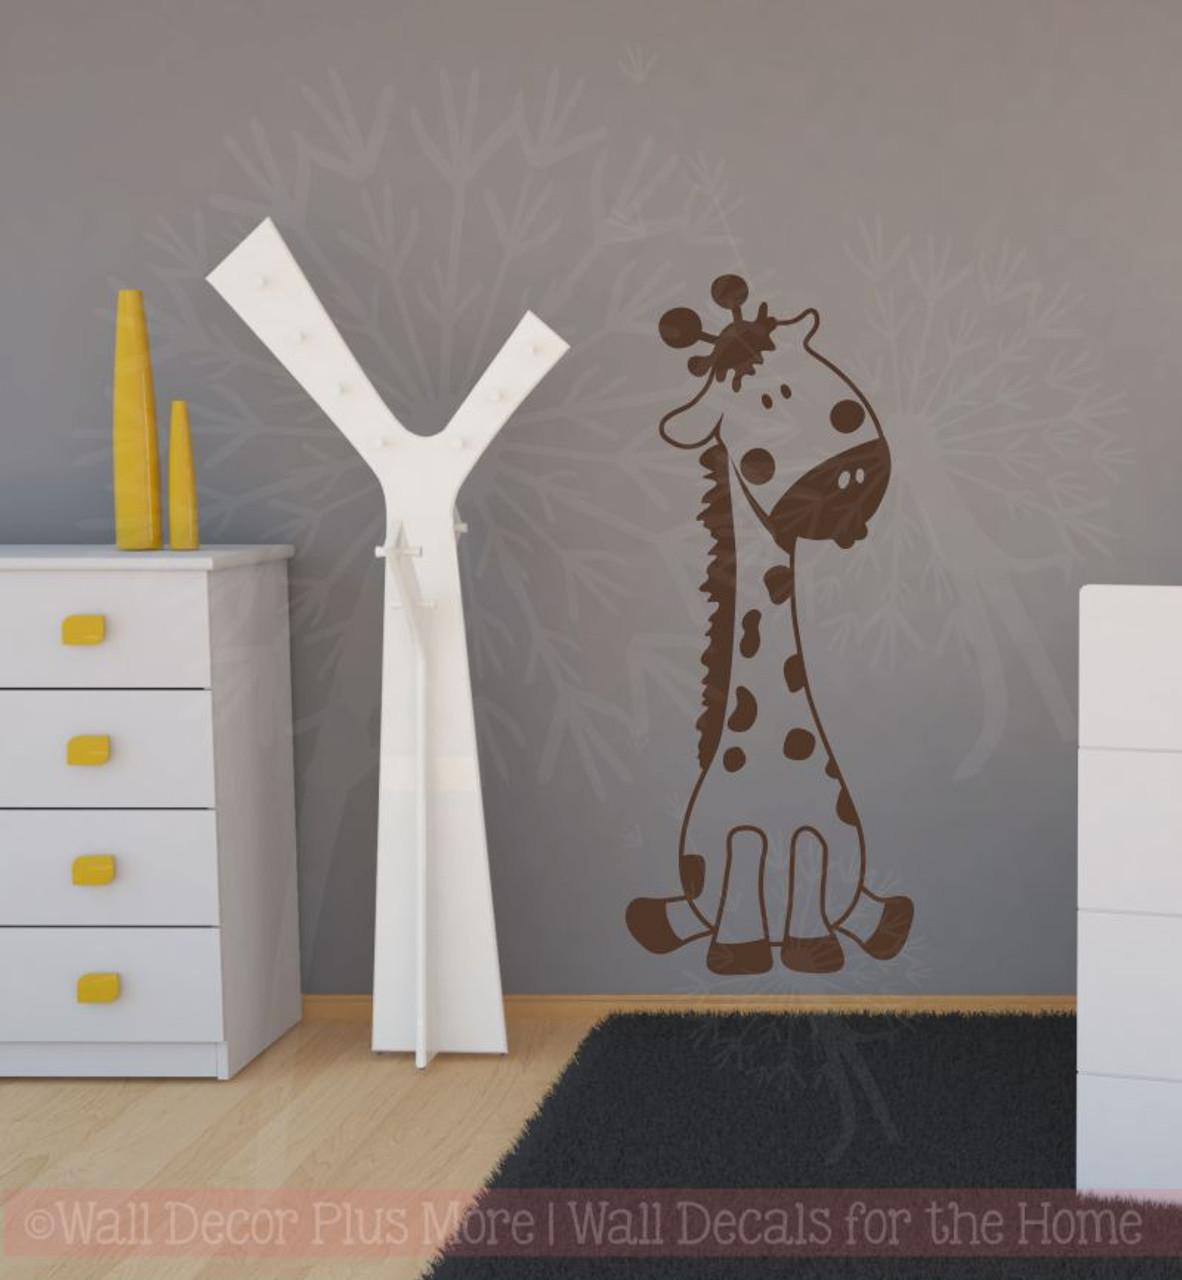 baby giraffe vinyl wall art sticker decals for nursery or child's room